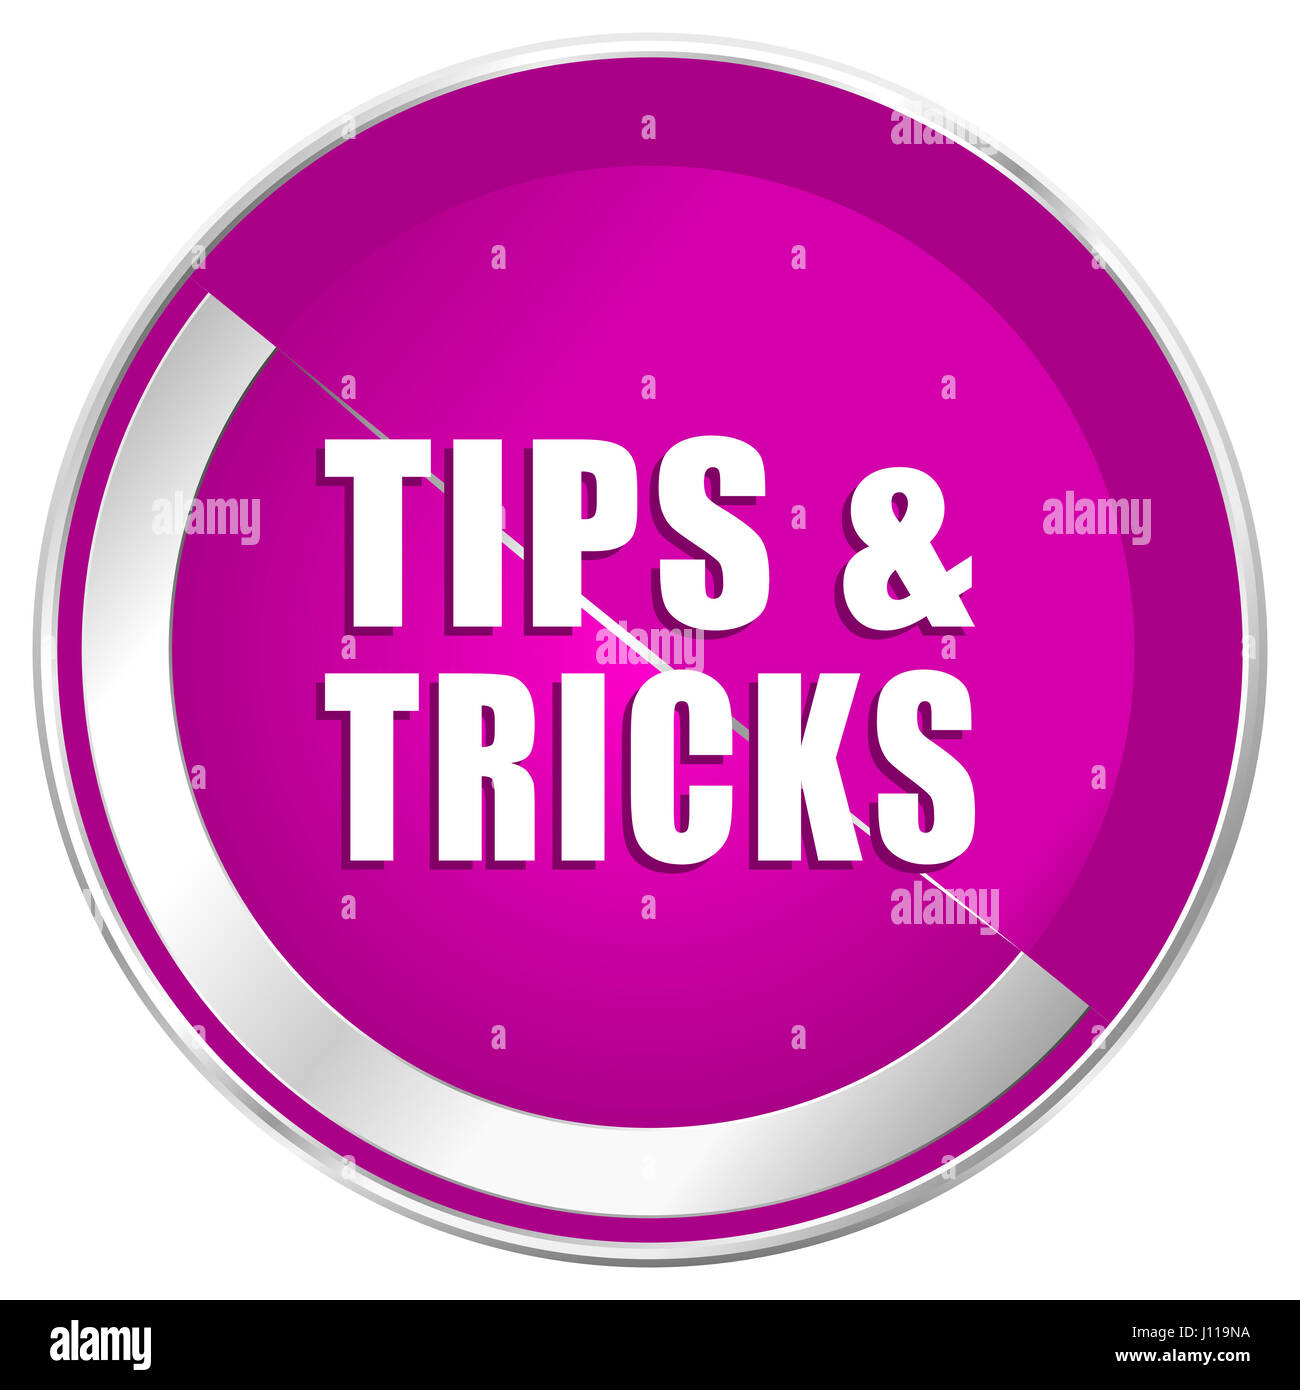 Tips Tricks Web Design Violet Silver Metallic Border Internet Icon Stock Photo Alamy